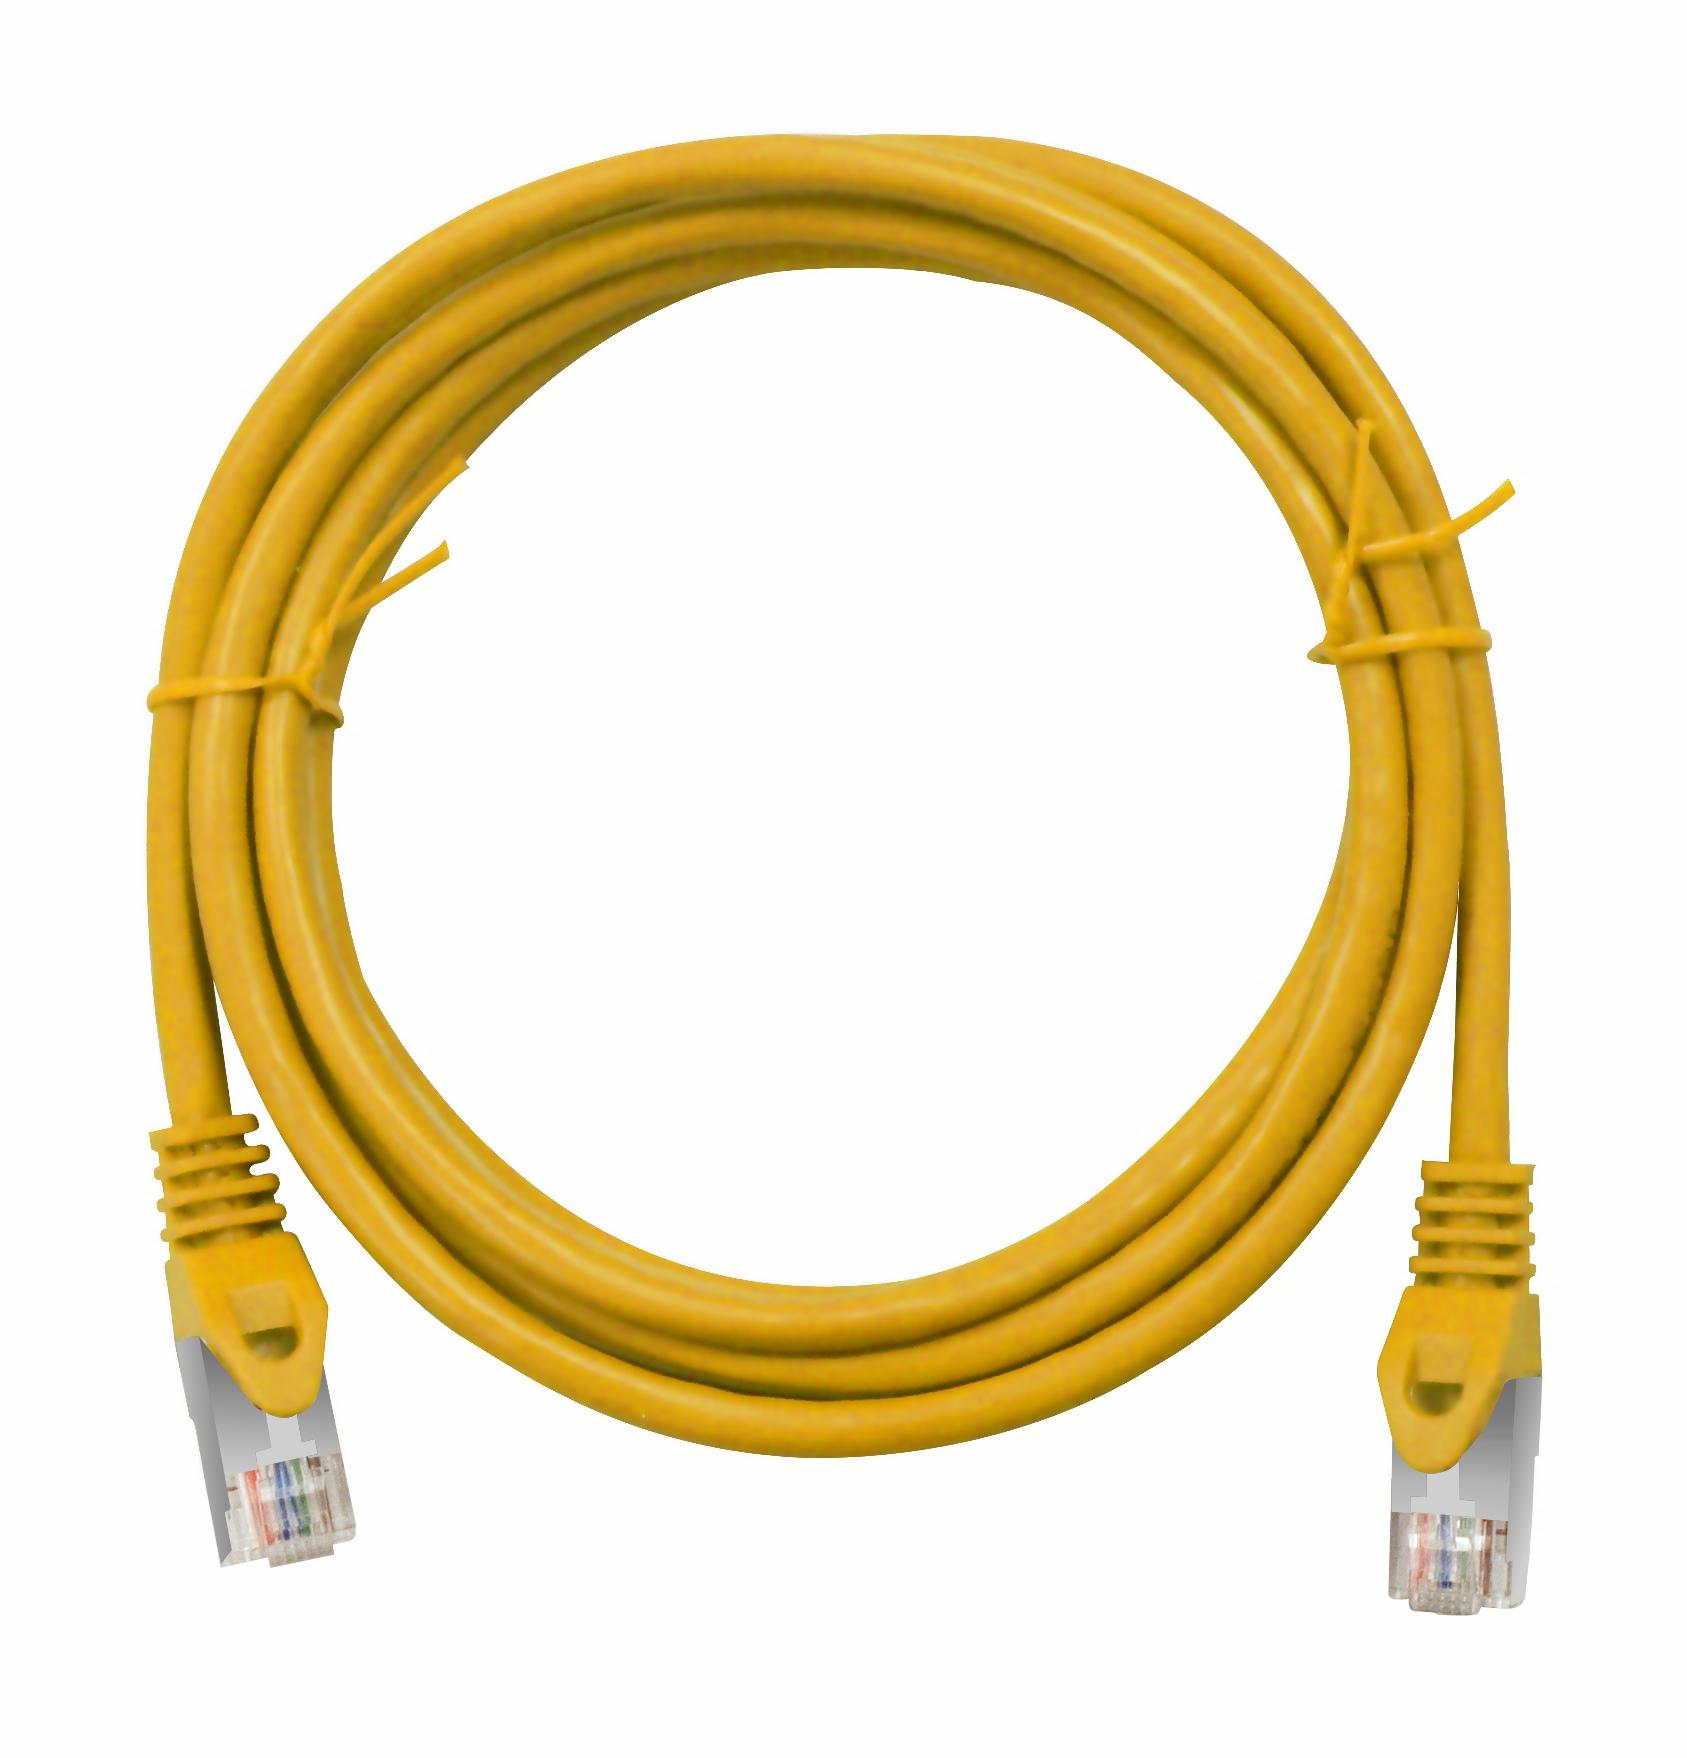 1 Stk Patchkabel RJ45 geschirmt Cat.6, PVC, gelb, 5,0m H6GLY05K0Y